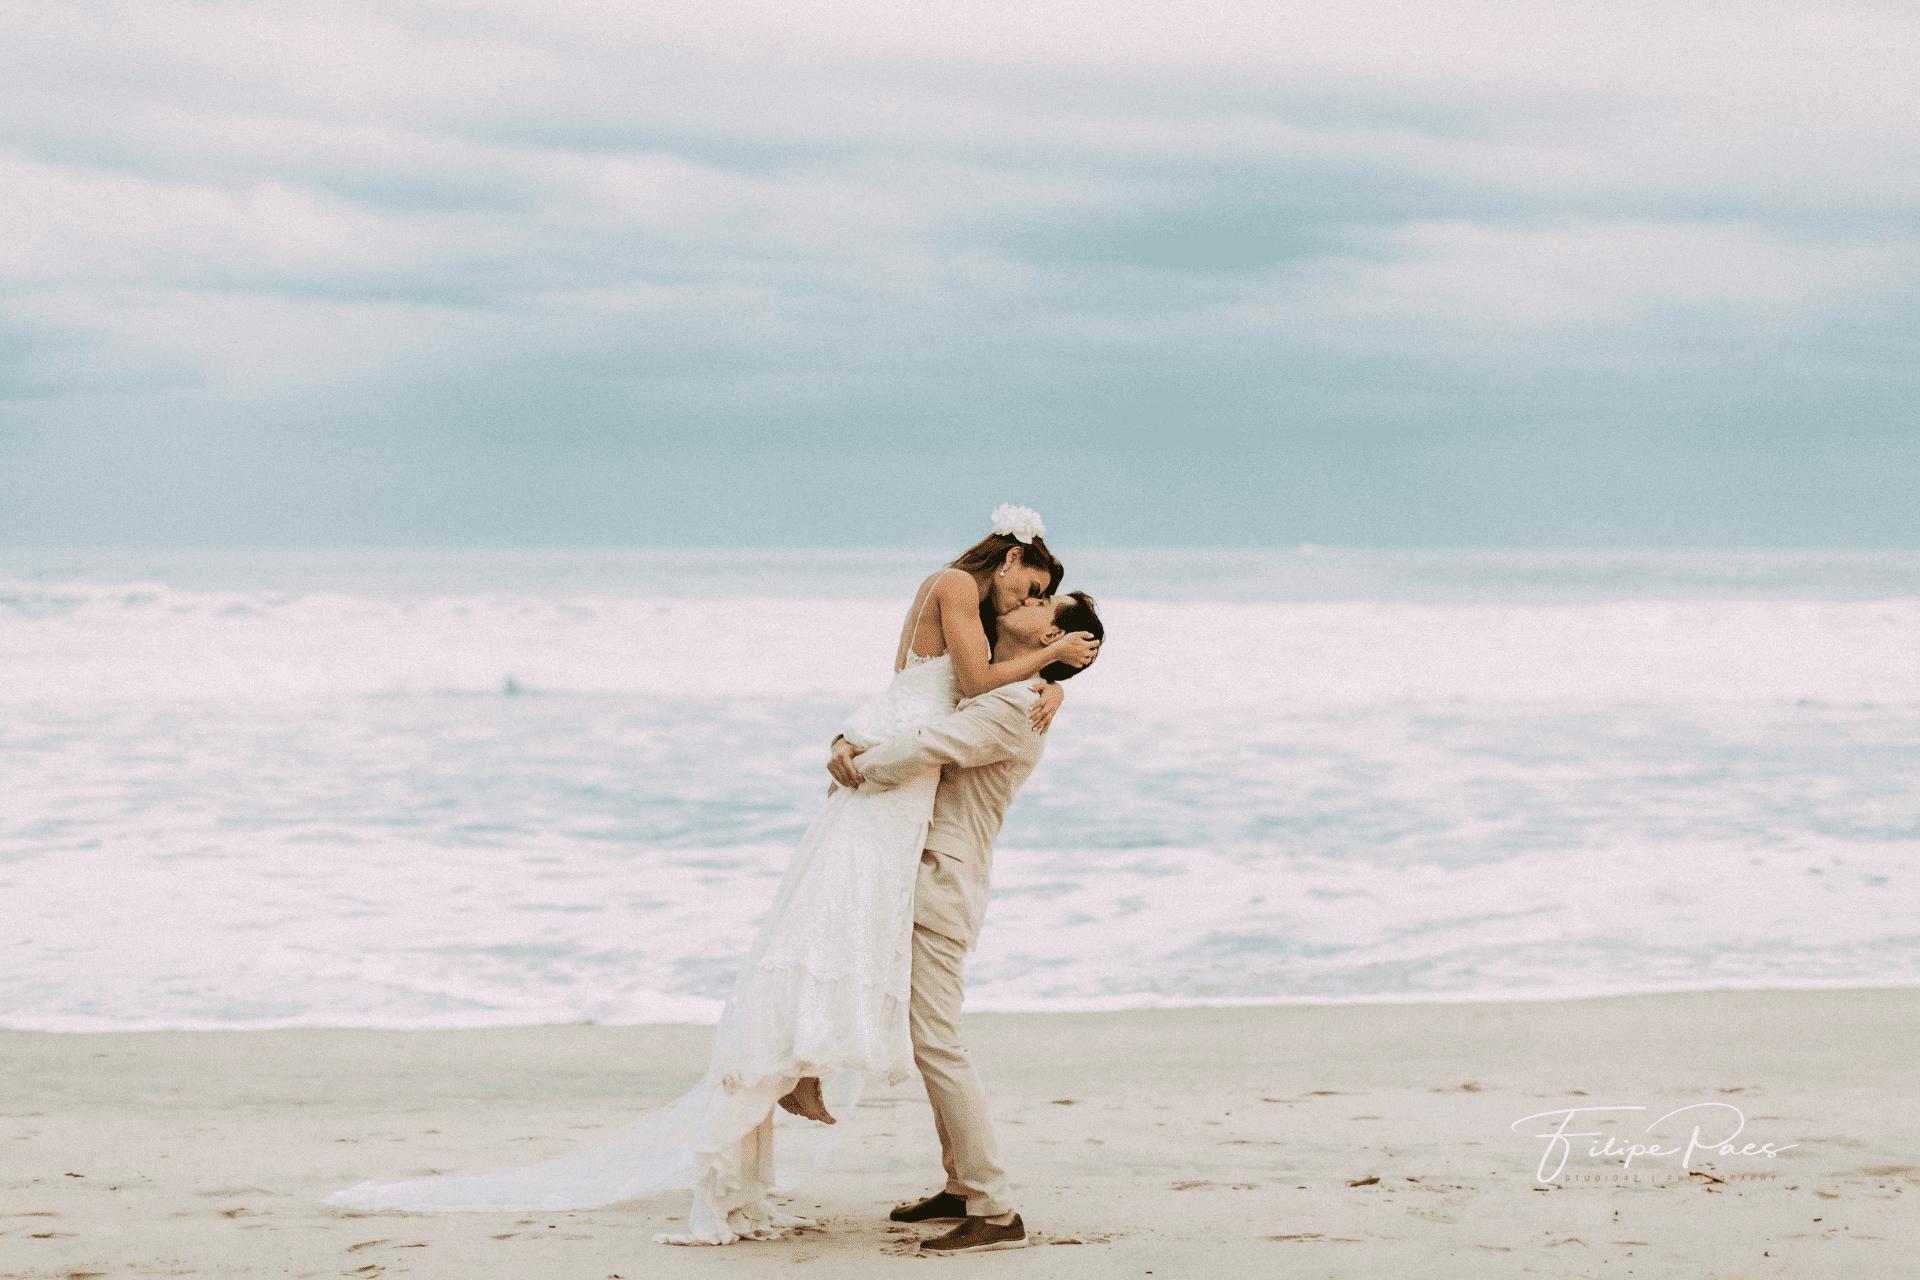 casamento-ao-ar-livre-casamento-de-dia-casamento-Maira-e-Erick-casamento-na-praia-DESTAQUE-ensaio-fotografico-ensaio-noivos-Fotografia-Filipe-Paes-Studio-47-